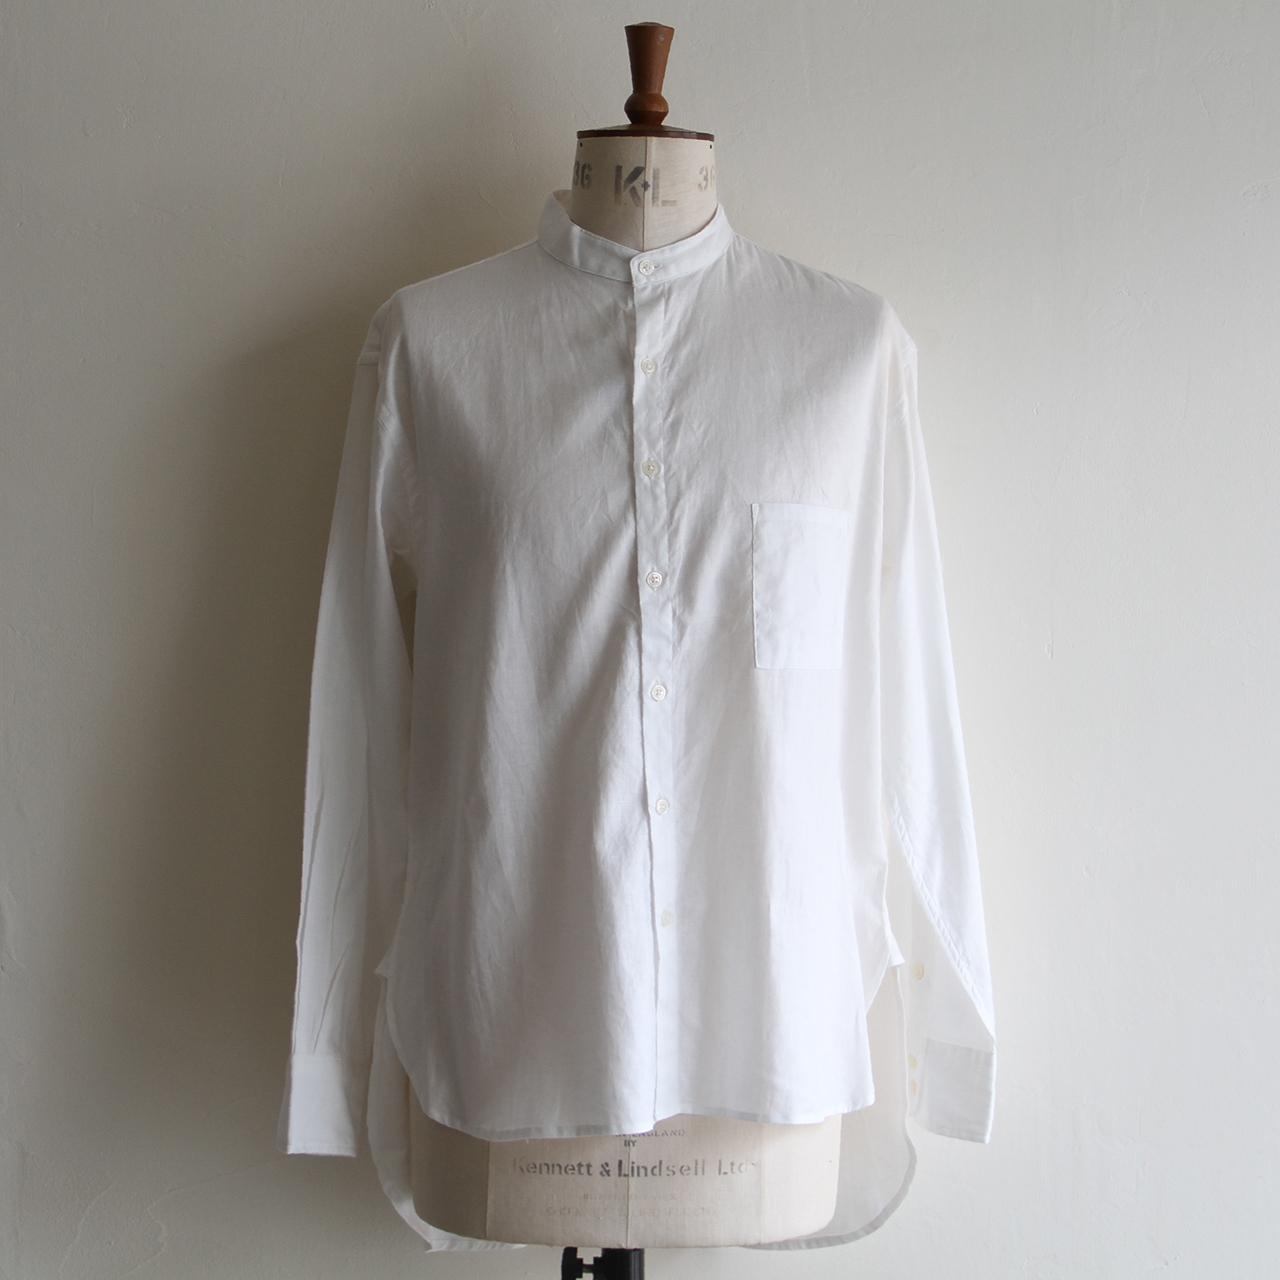 H.UNIT【 mens 】cotton linen twill bandcollar shirts